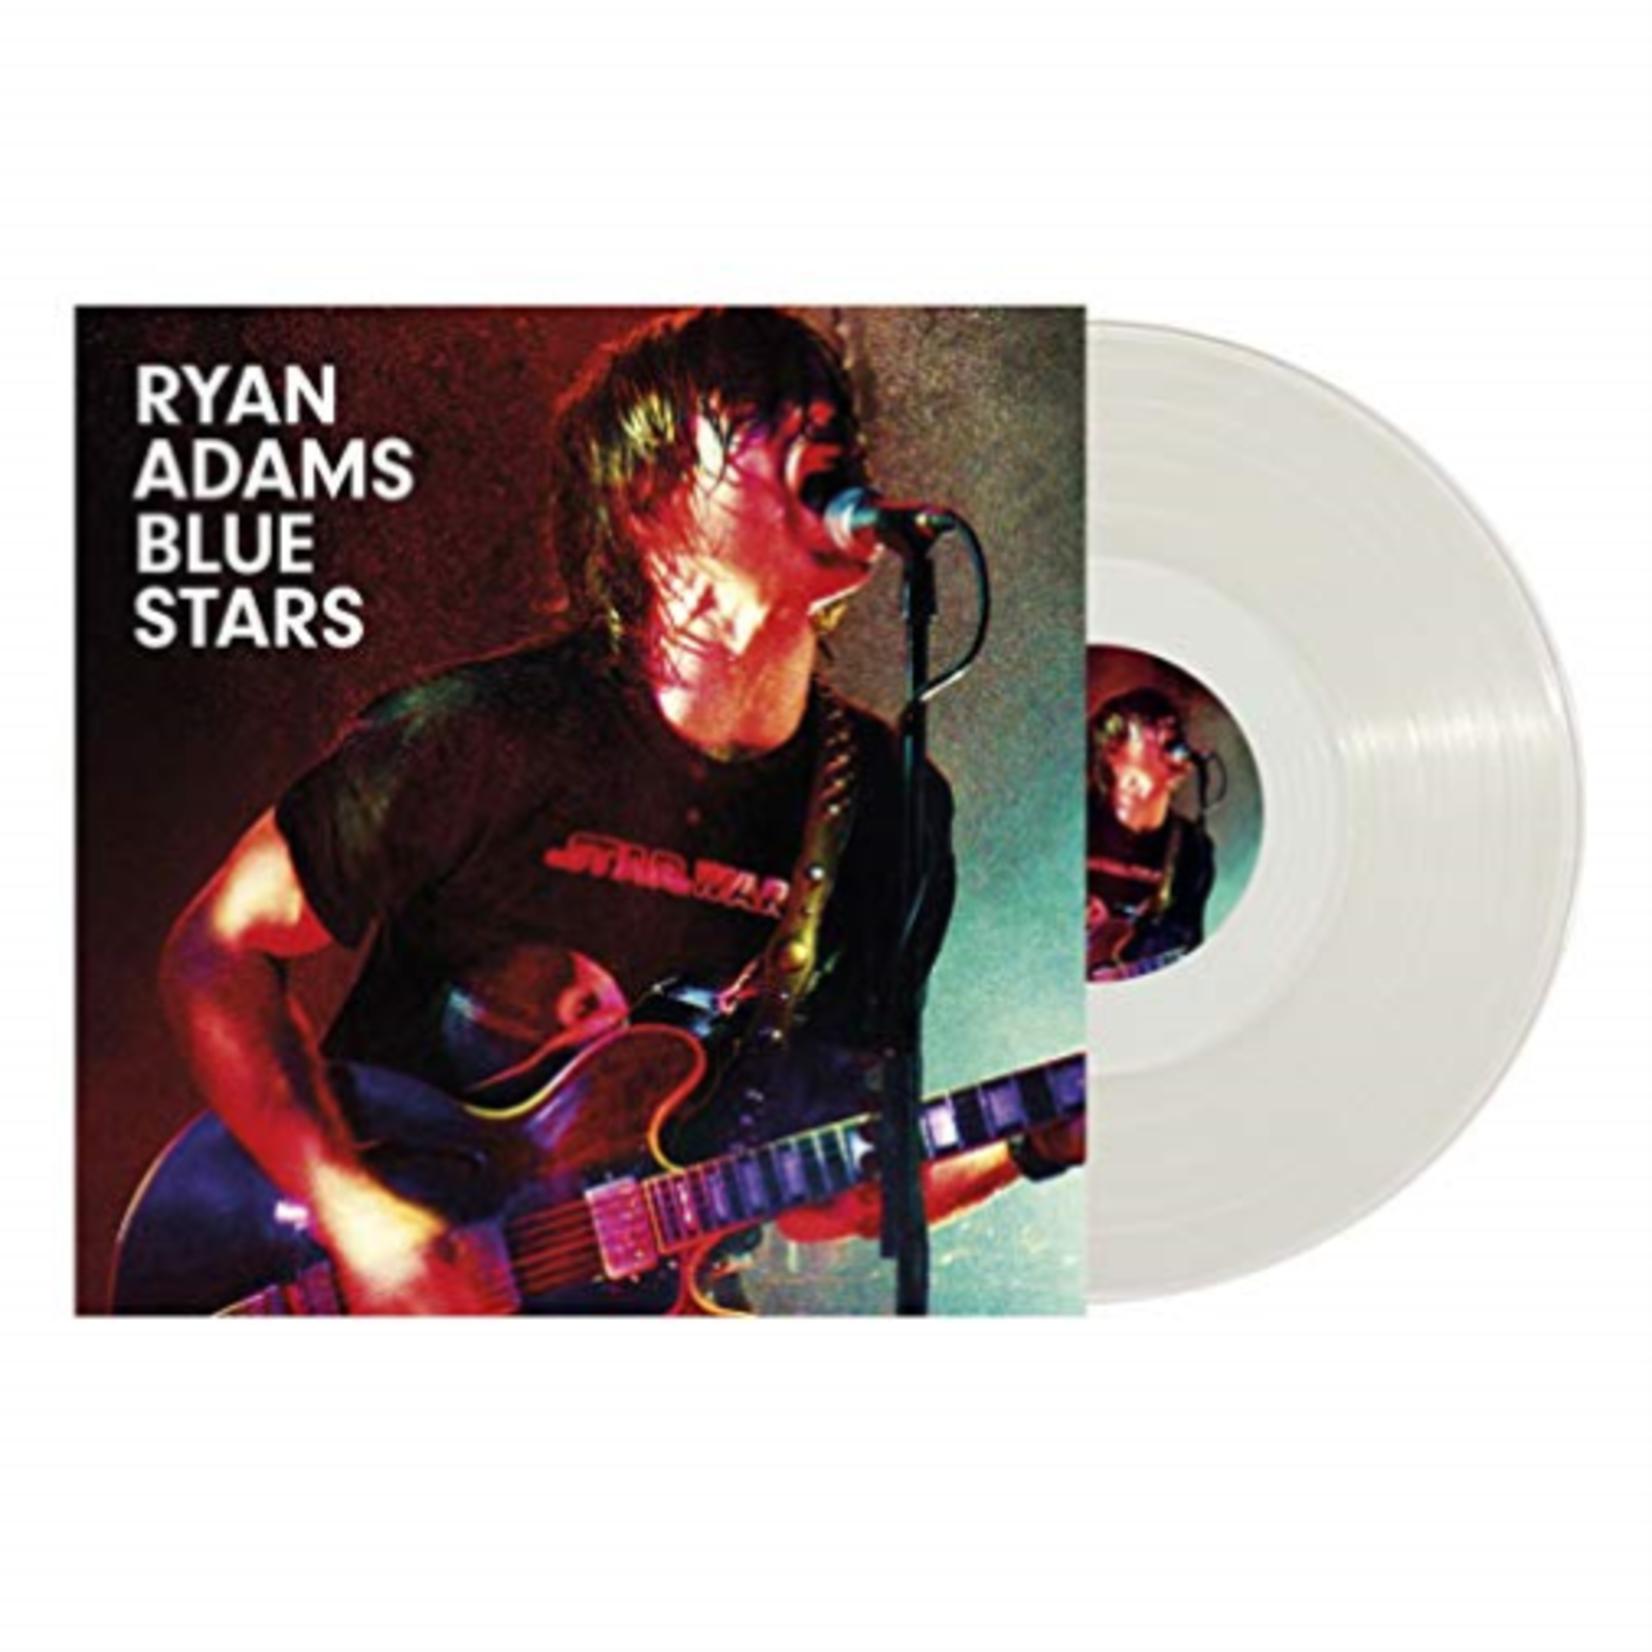 RYAN ADAMS BLUE STARS